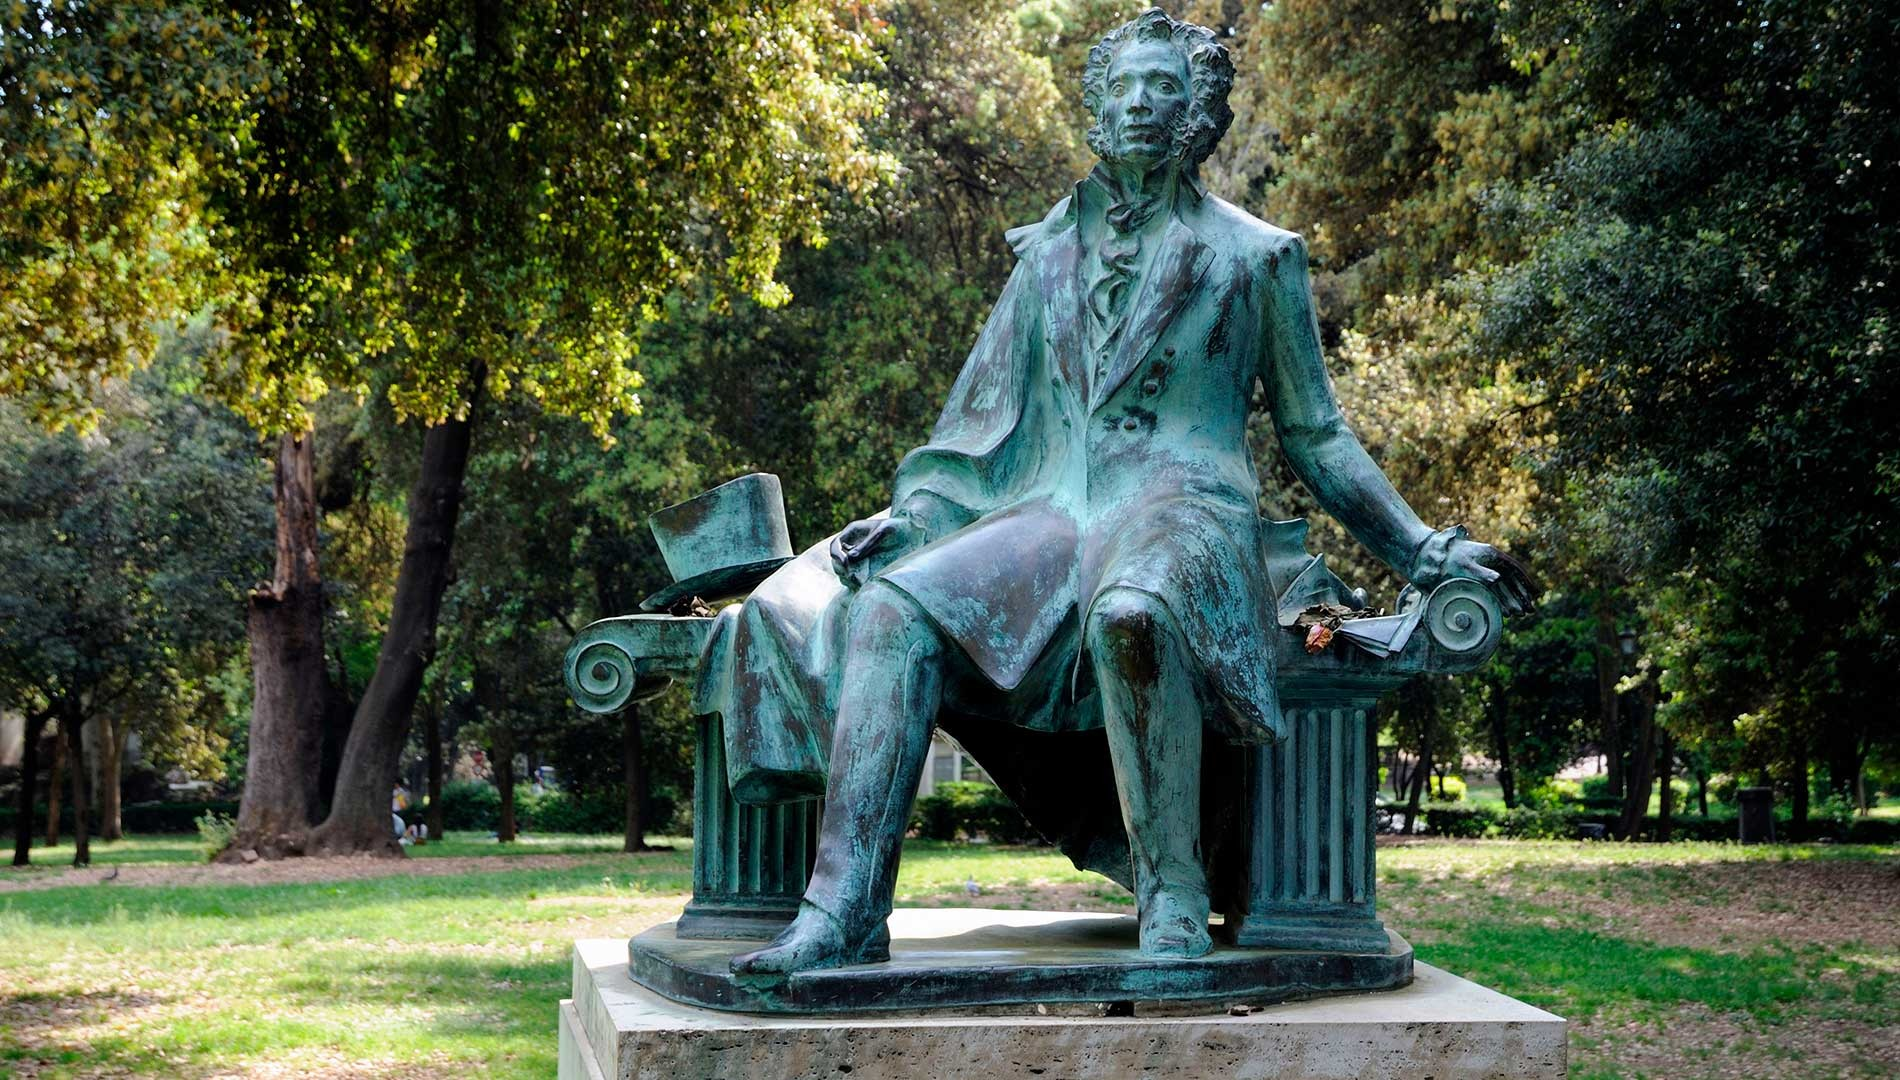 Monument to Pushkin in Rome, Villa Borghese gardens